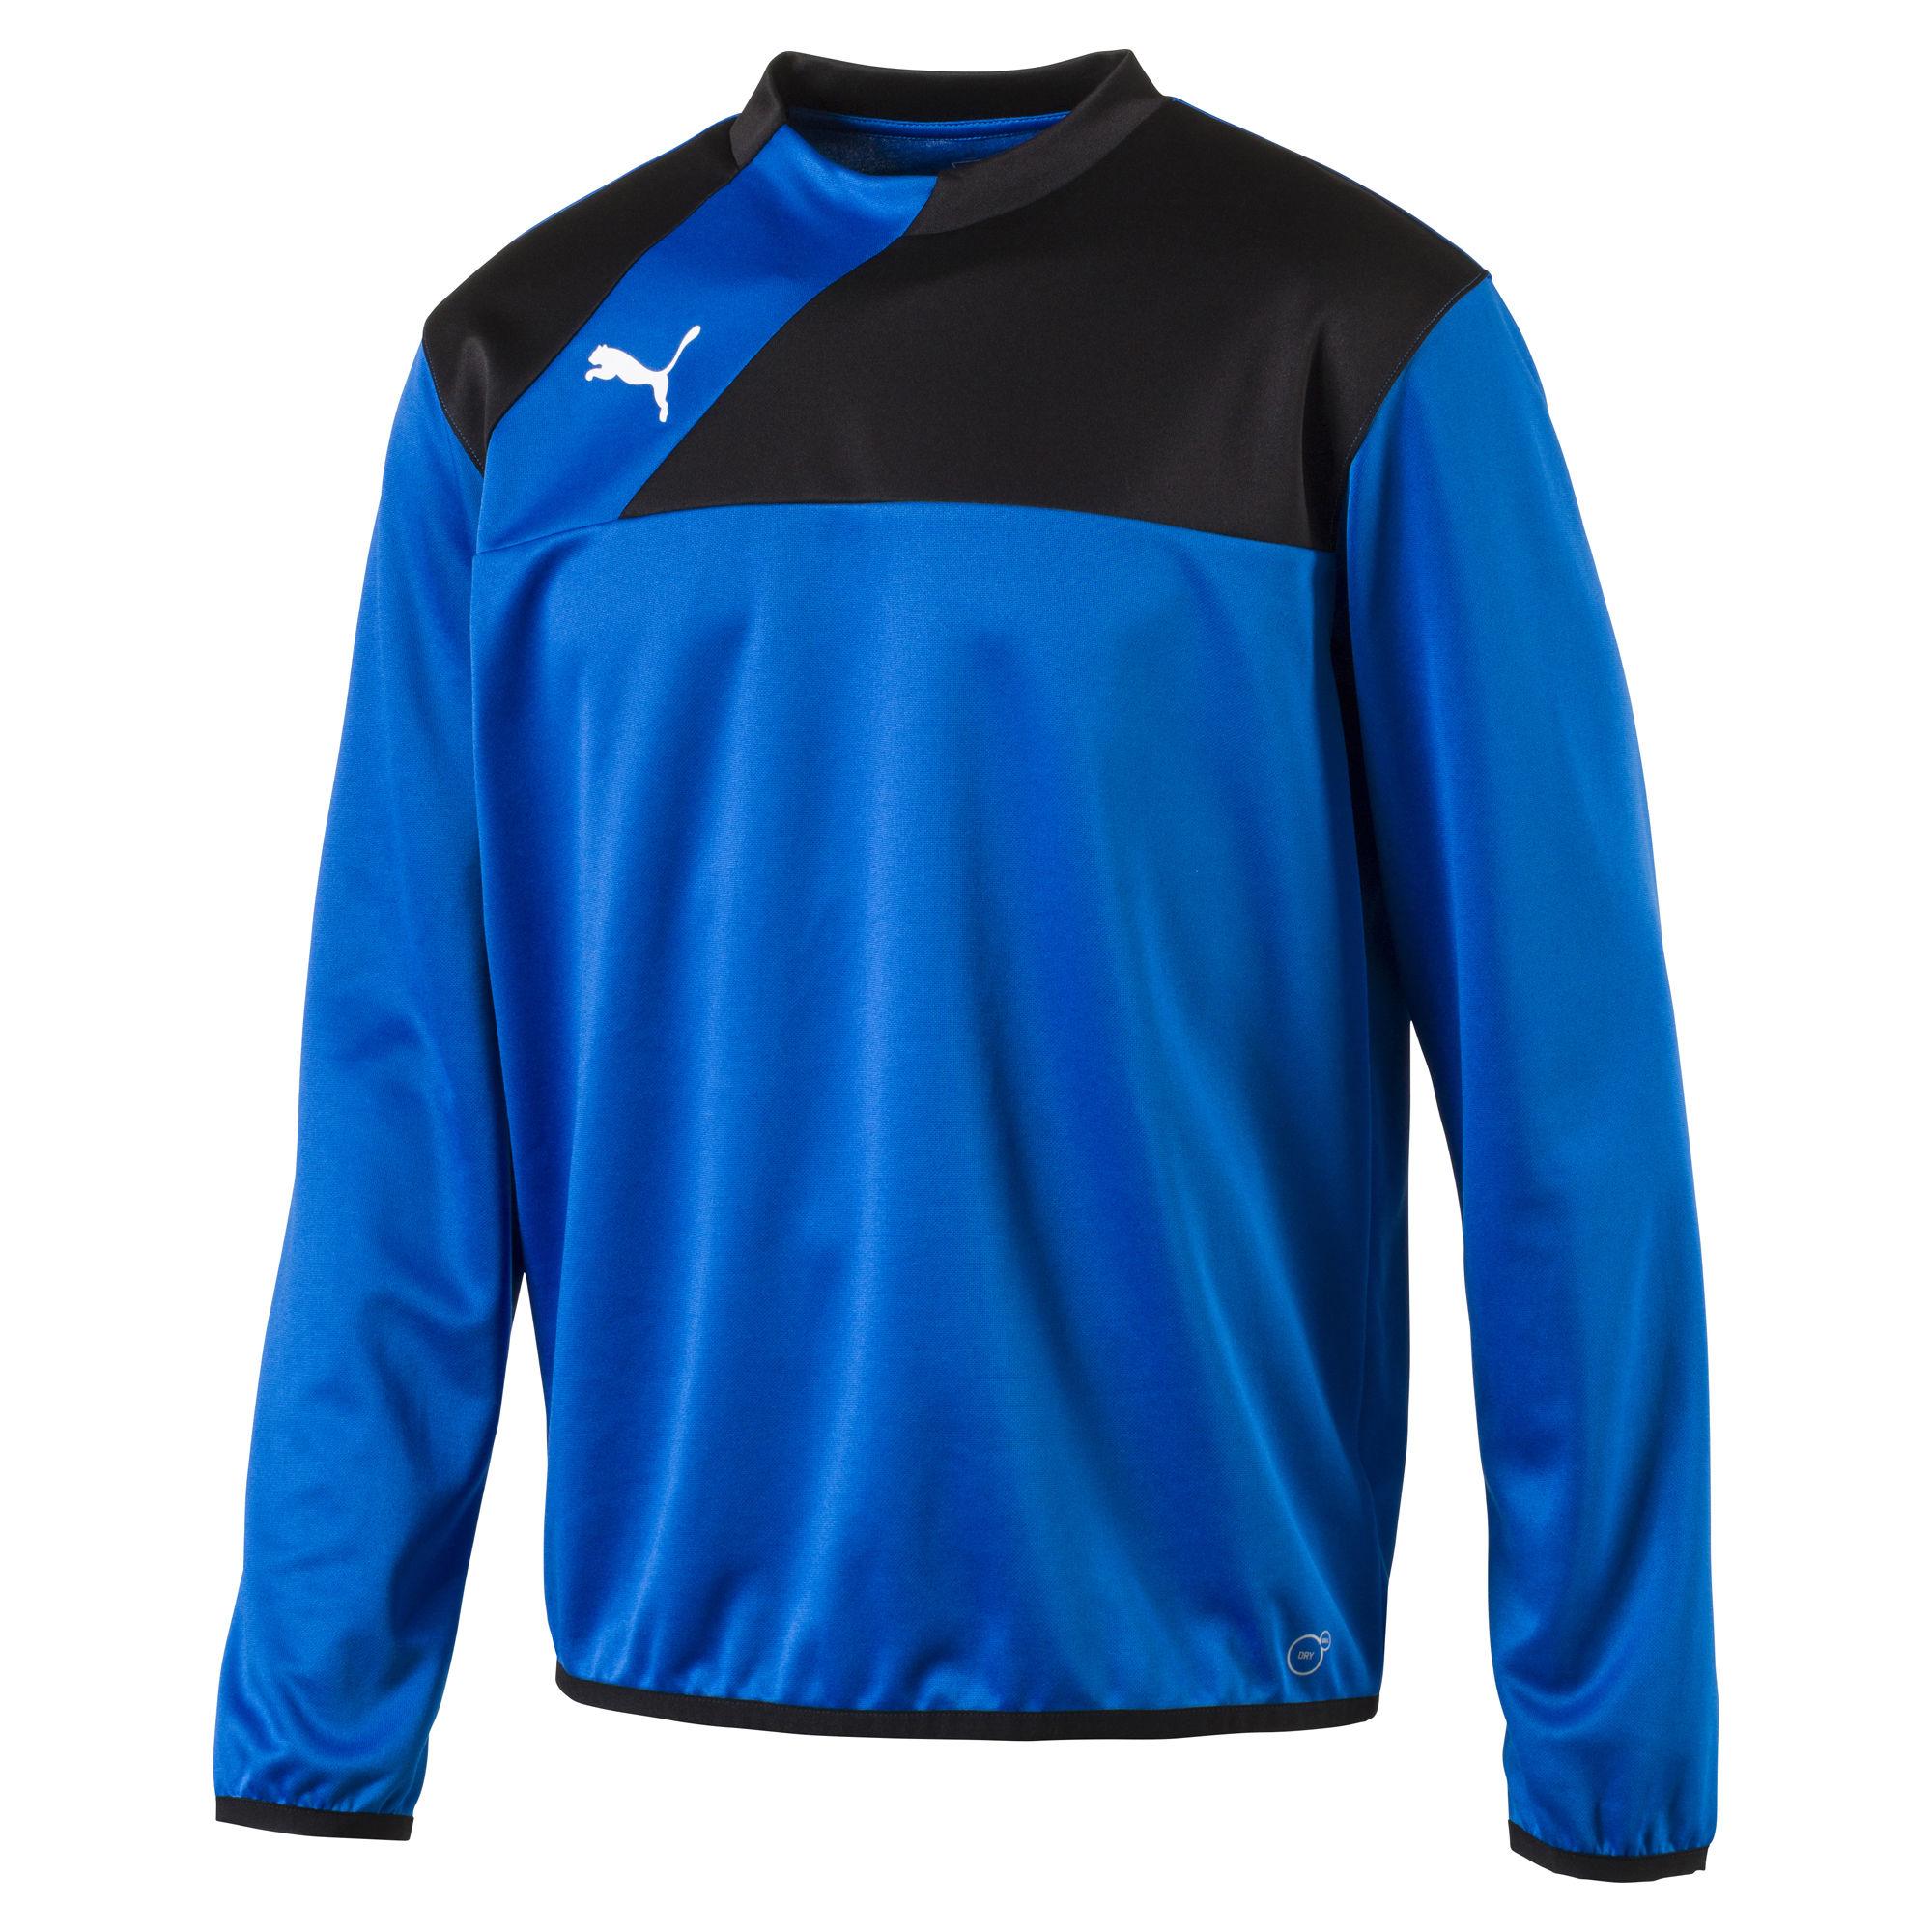 Puma Esquadra Herren Training Sweat 654380 23 blau